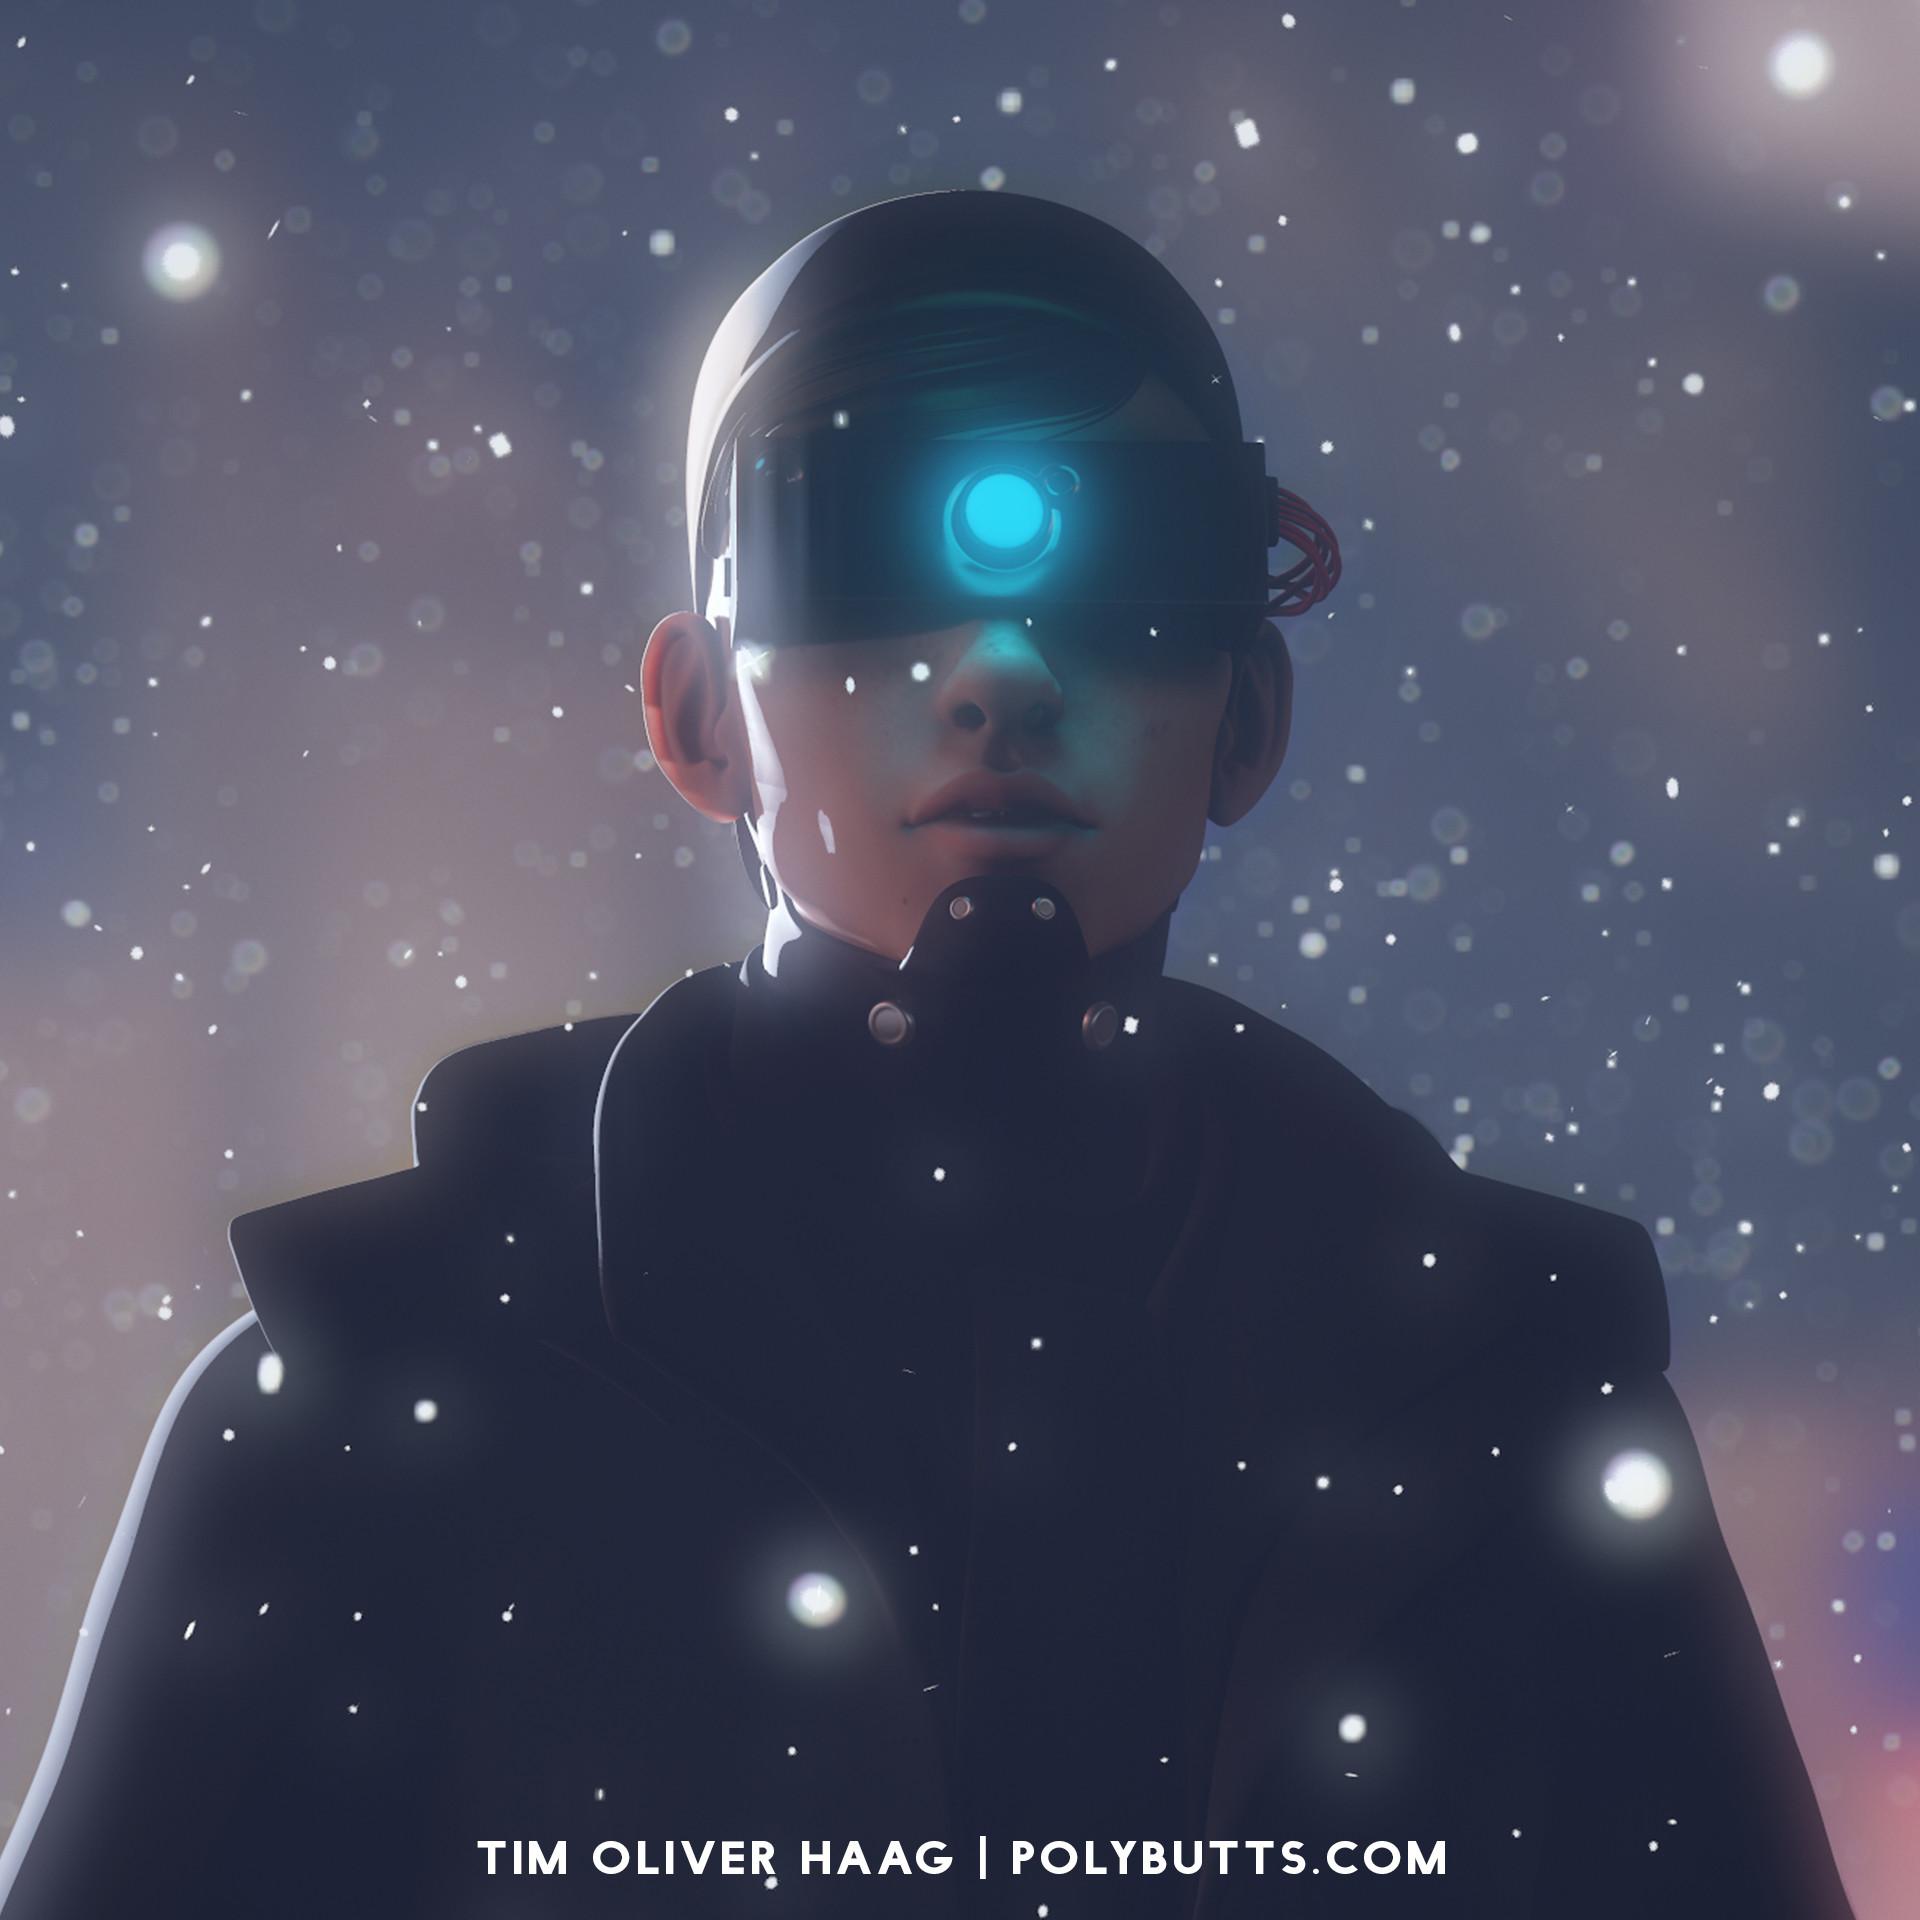 Tim oliver haag cyberdude1